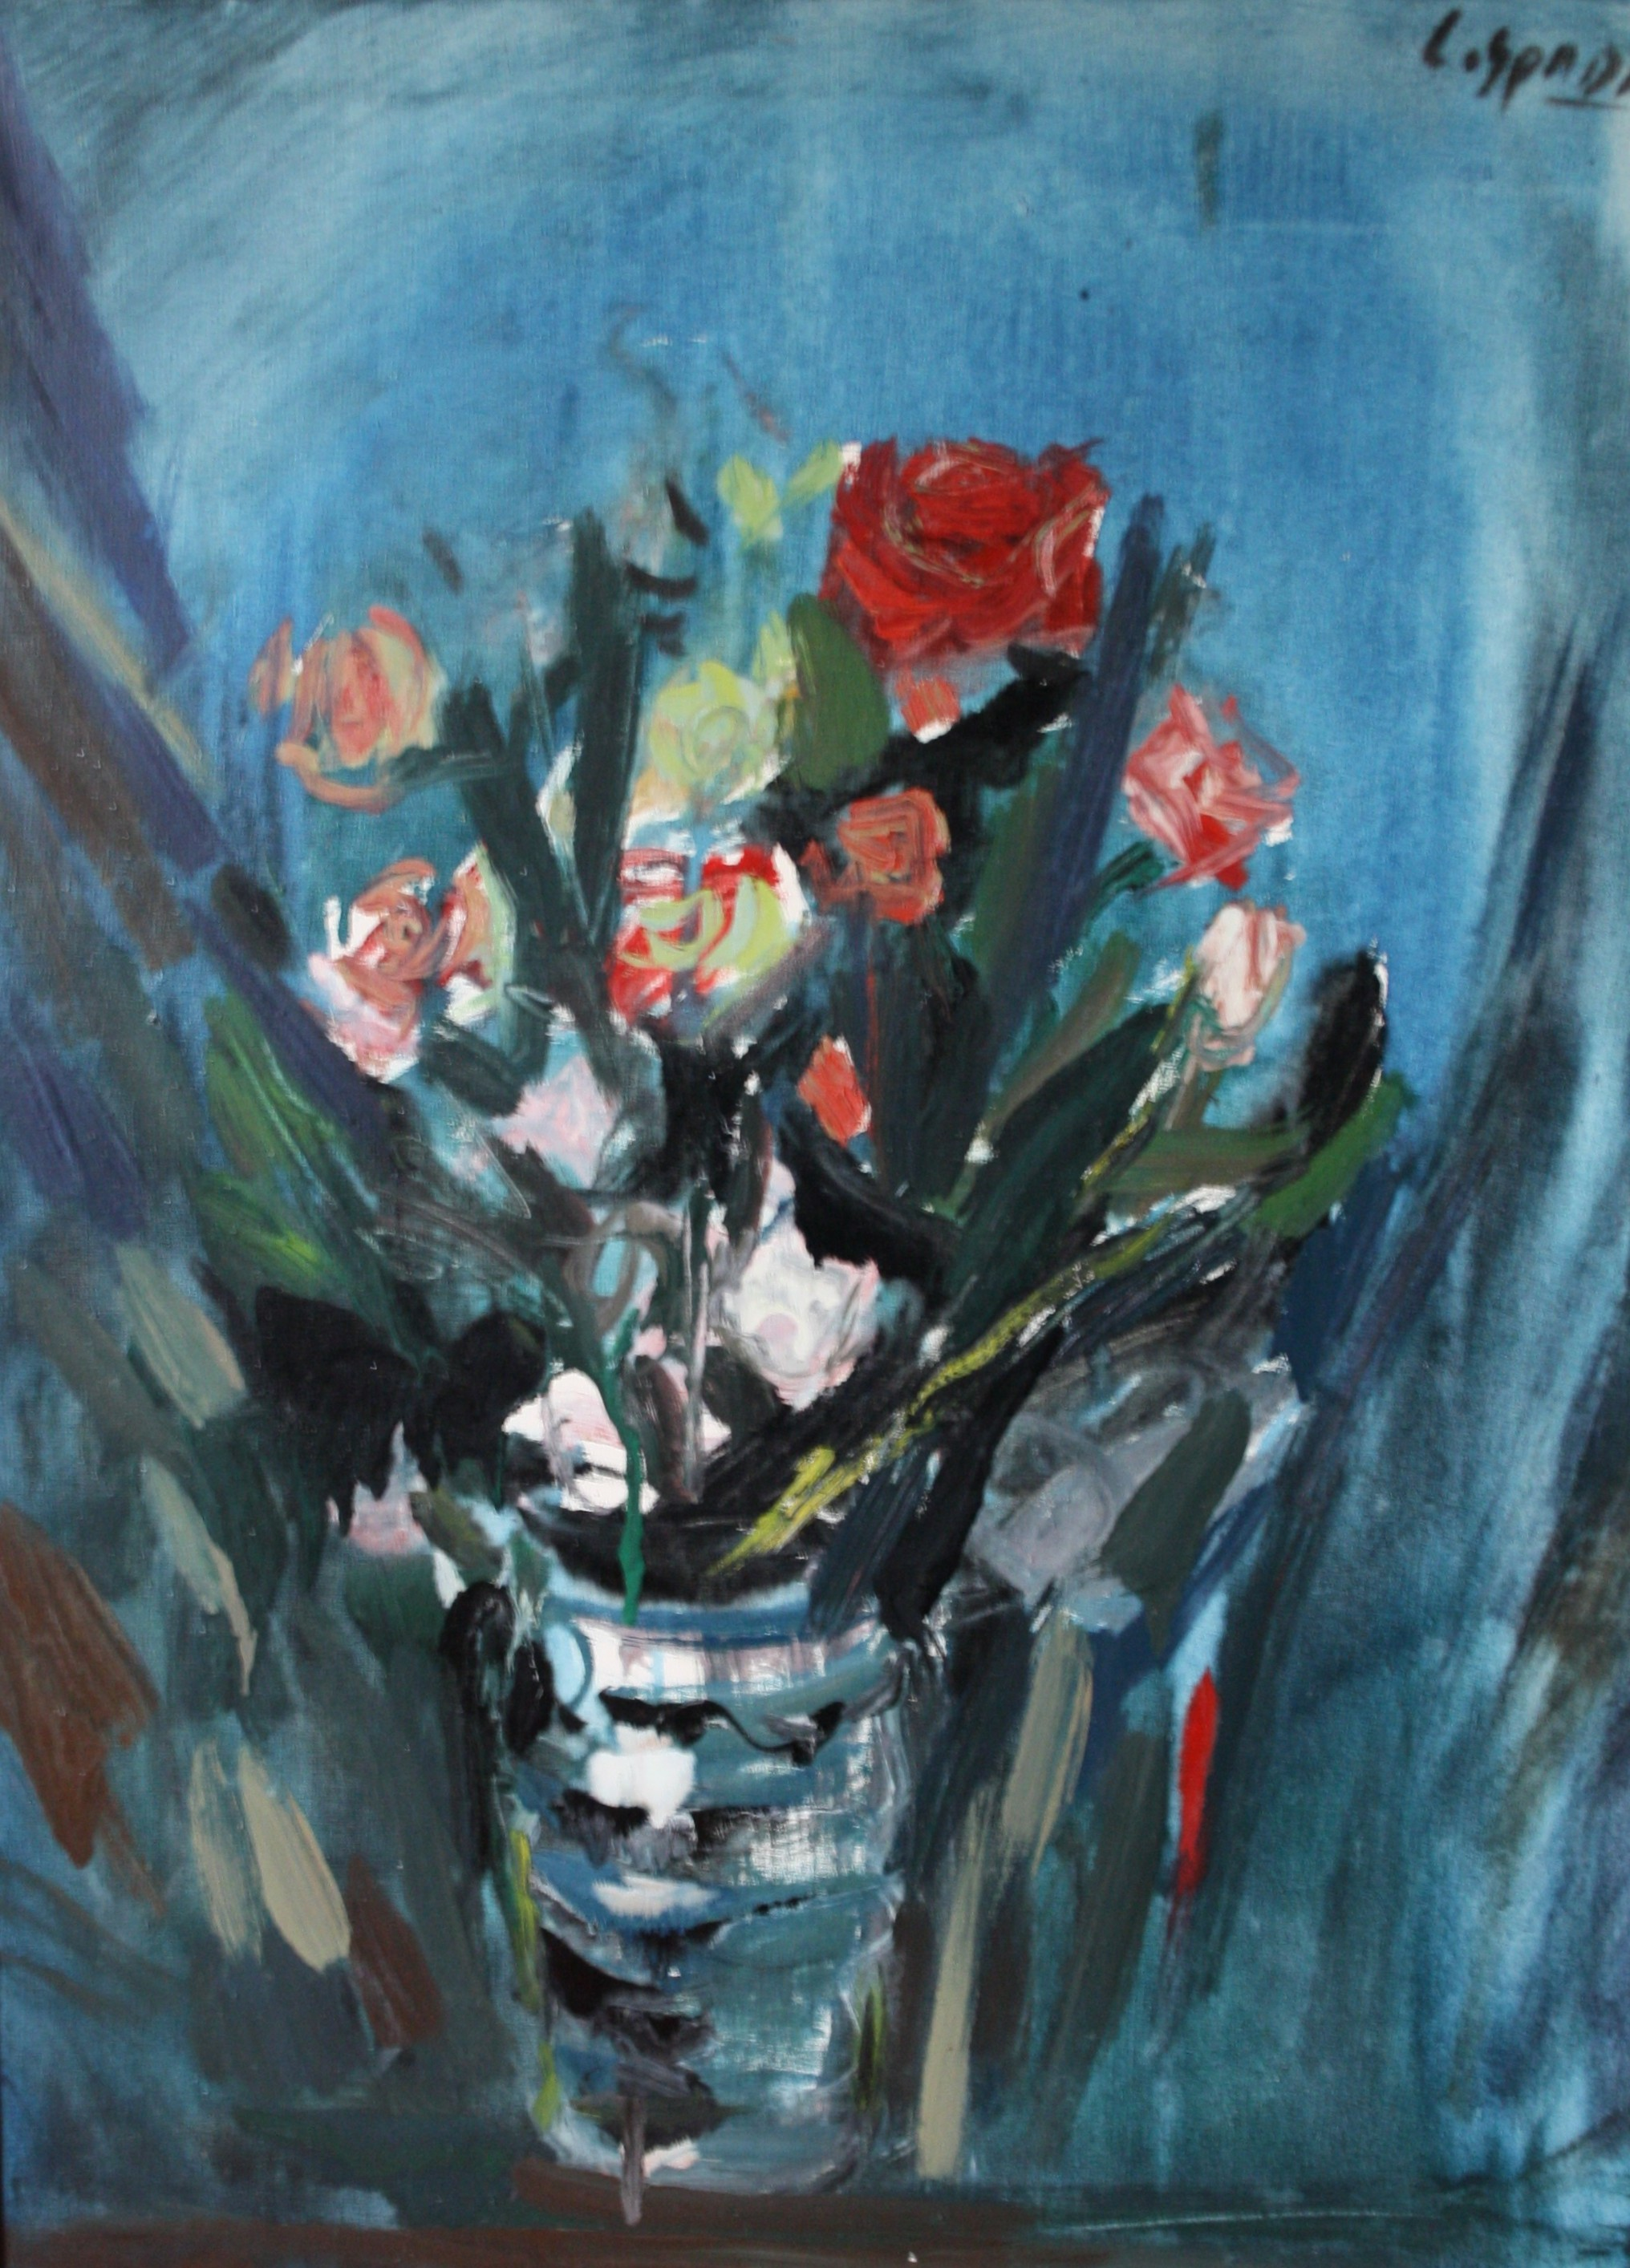 Spada Costantino, olio su tela 50x70, anni 70